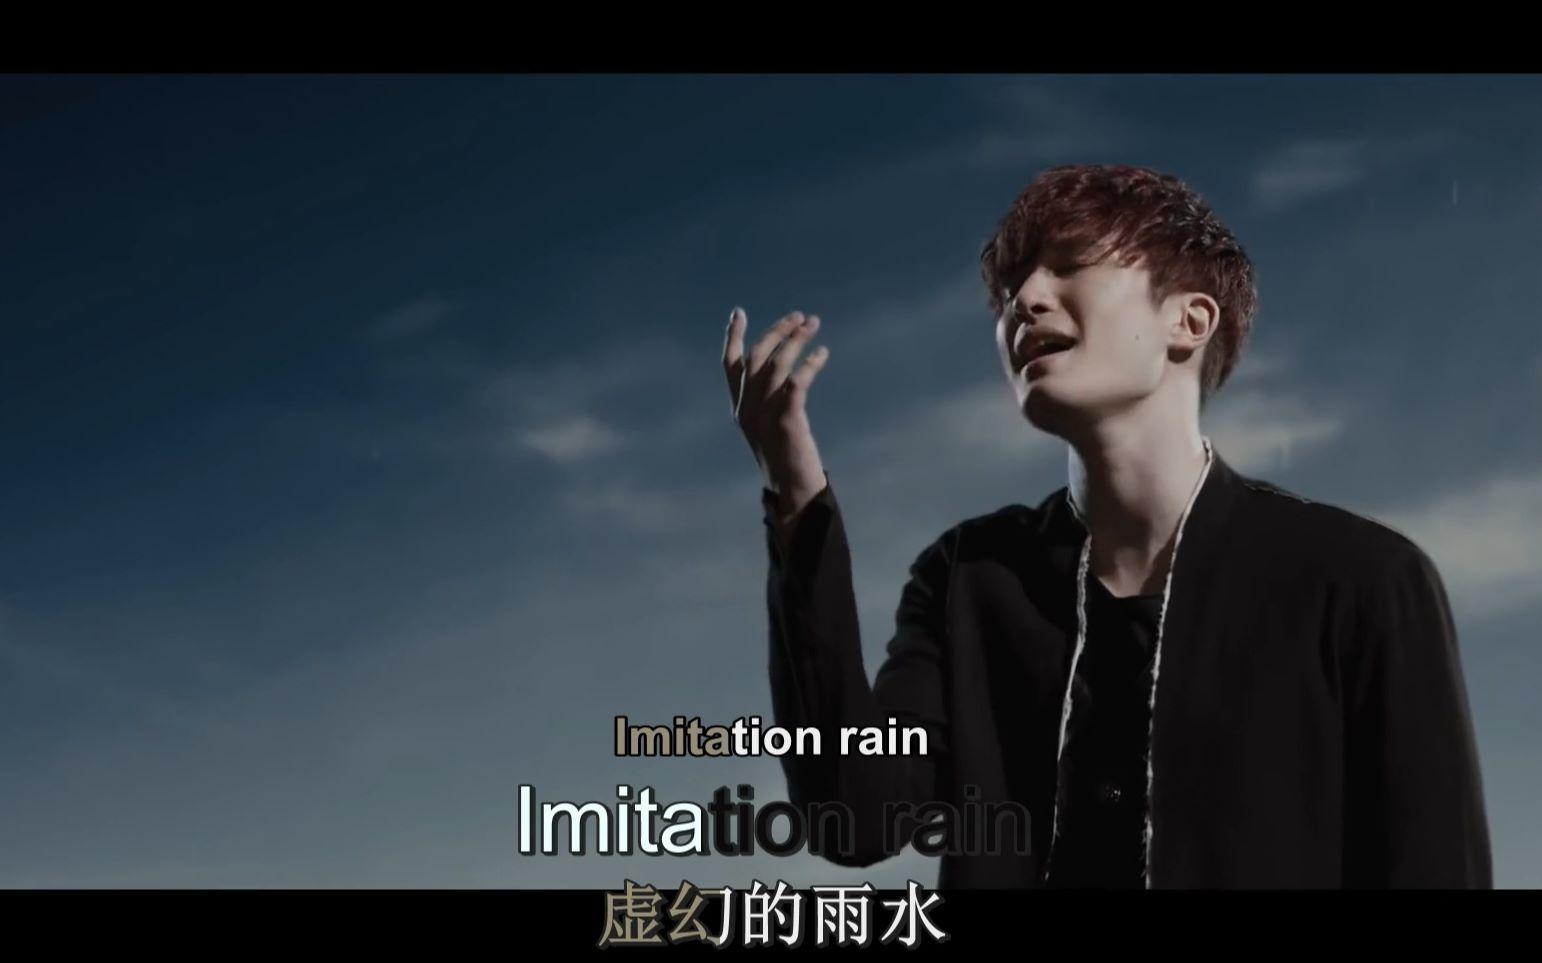 Rain Sixtones 歌詞 imitation